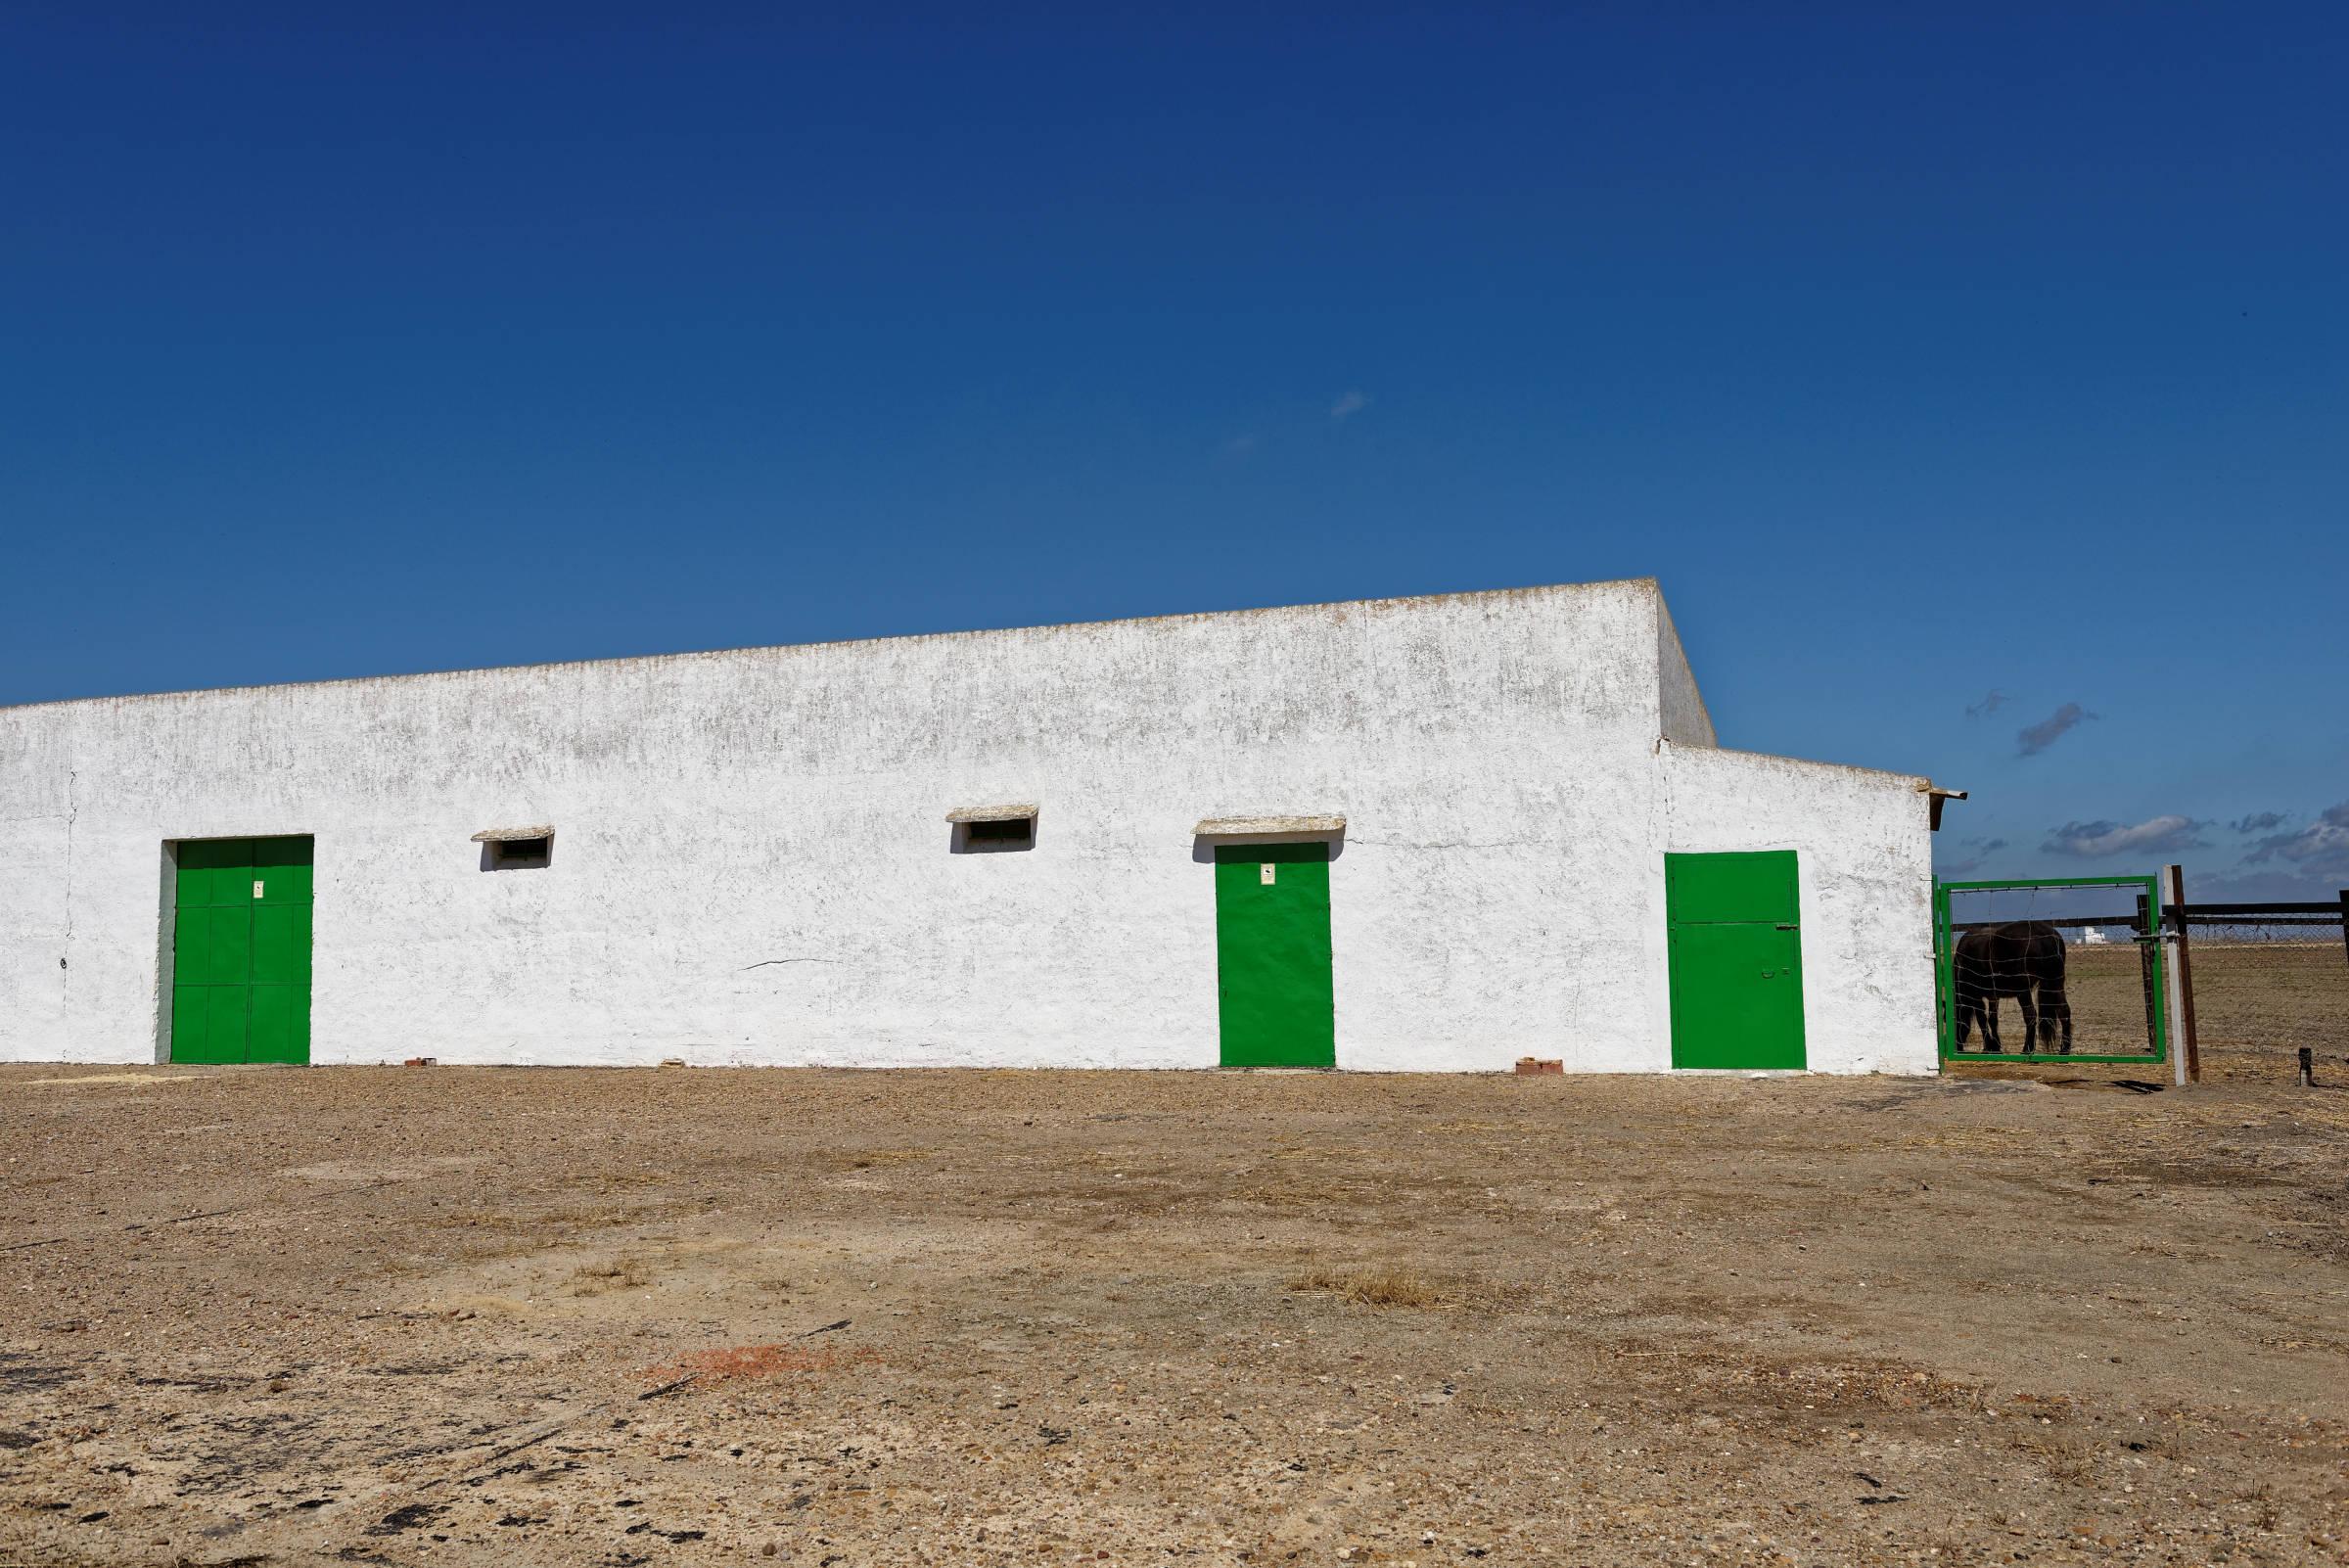 160414-Isla minima - Escobar (Andalousie) (12)